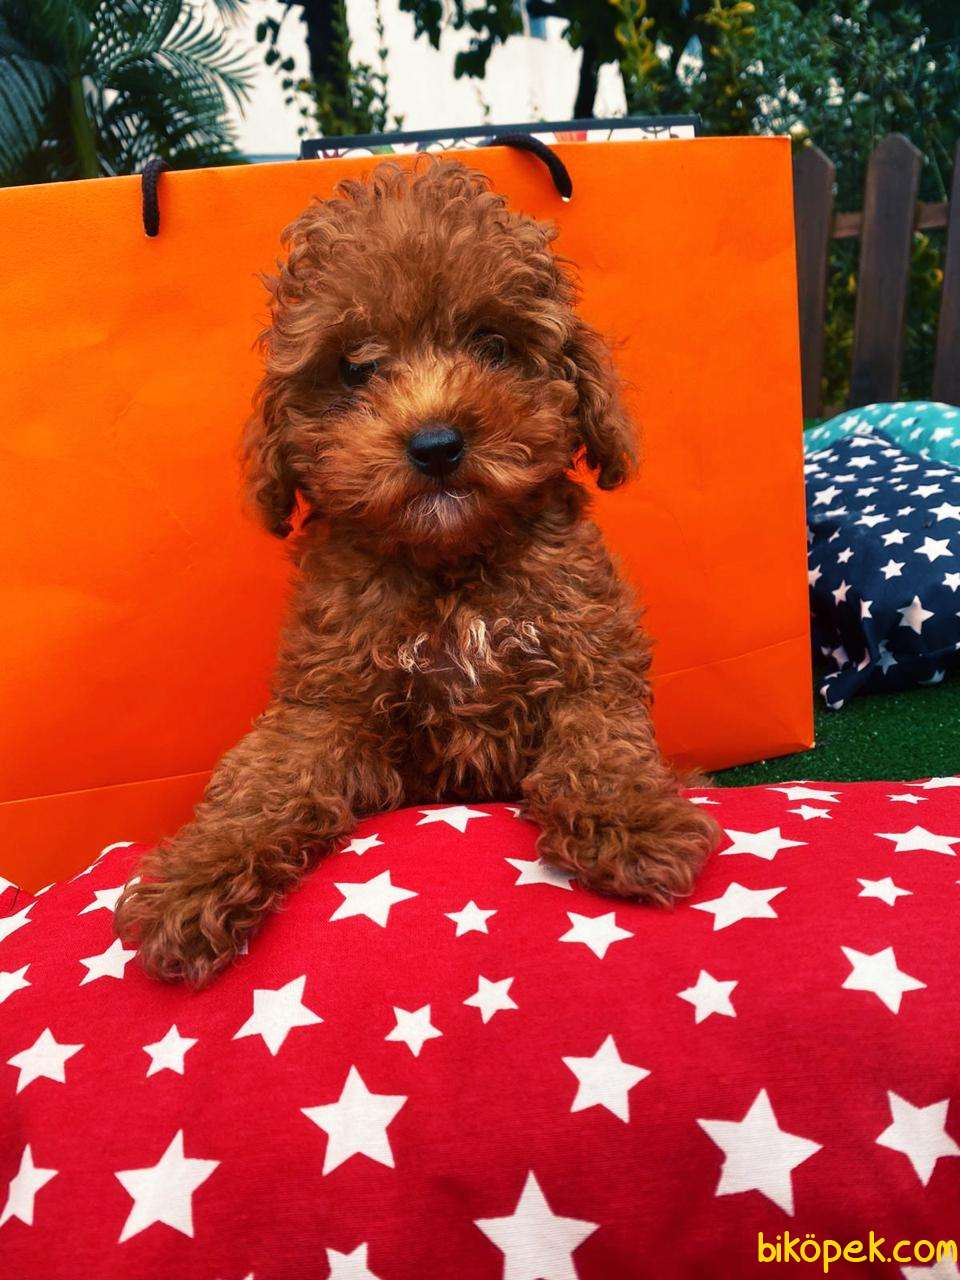 Ücretli Wc Eği̇ti̇mli̇ Özel Renk Poodle Yavrular 3